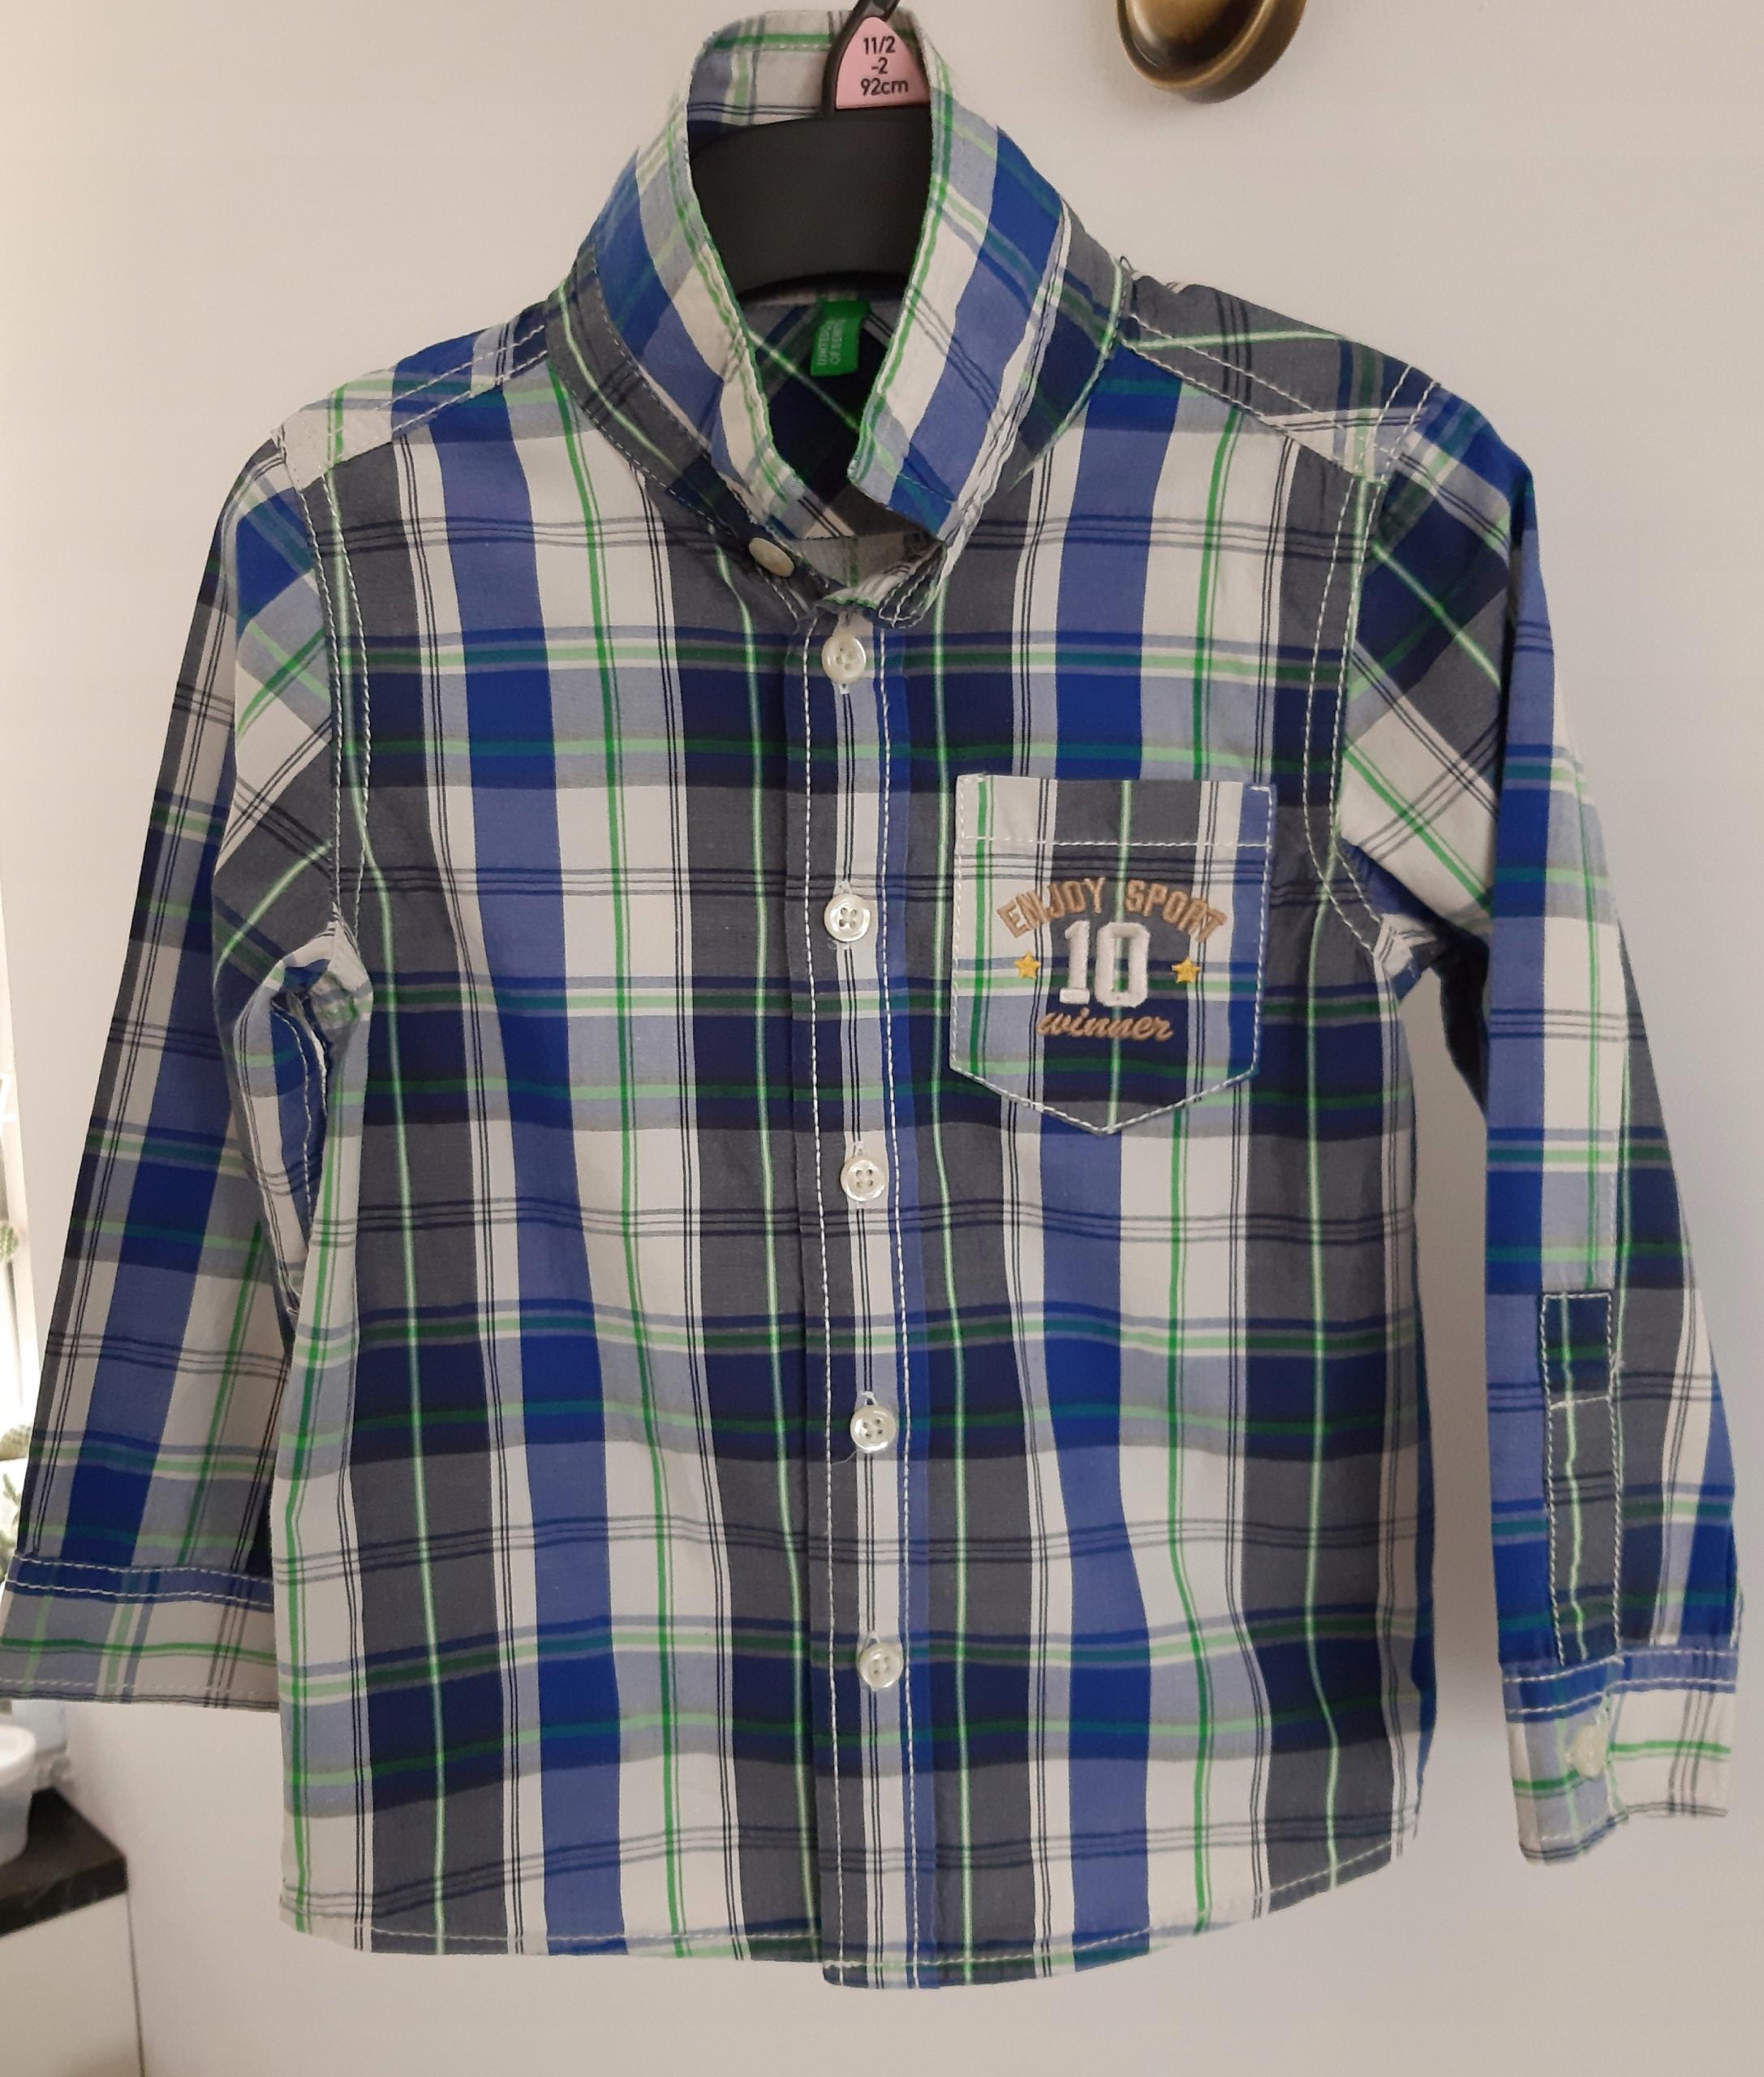 Koszula chłopięca BENETTON w kratkę R. 92cm 2lata